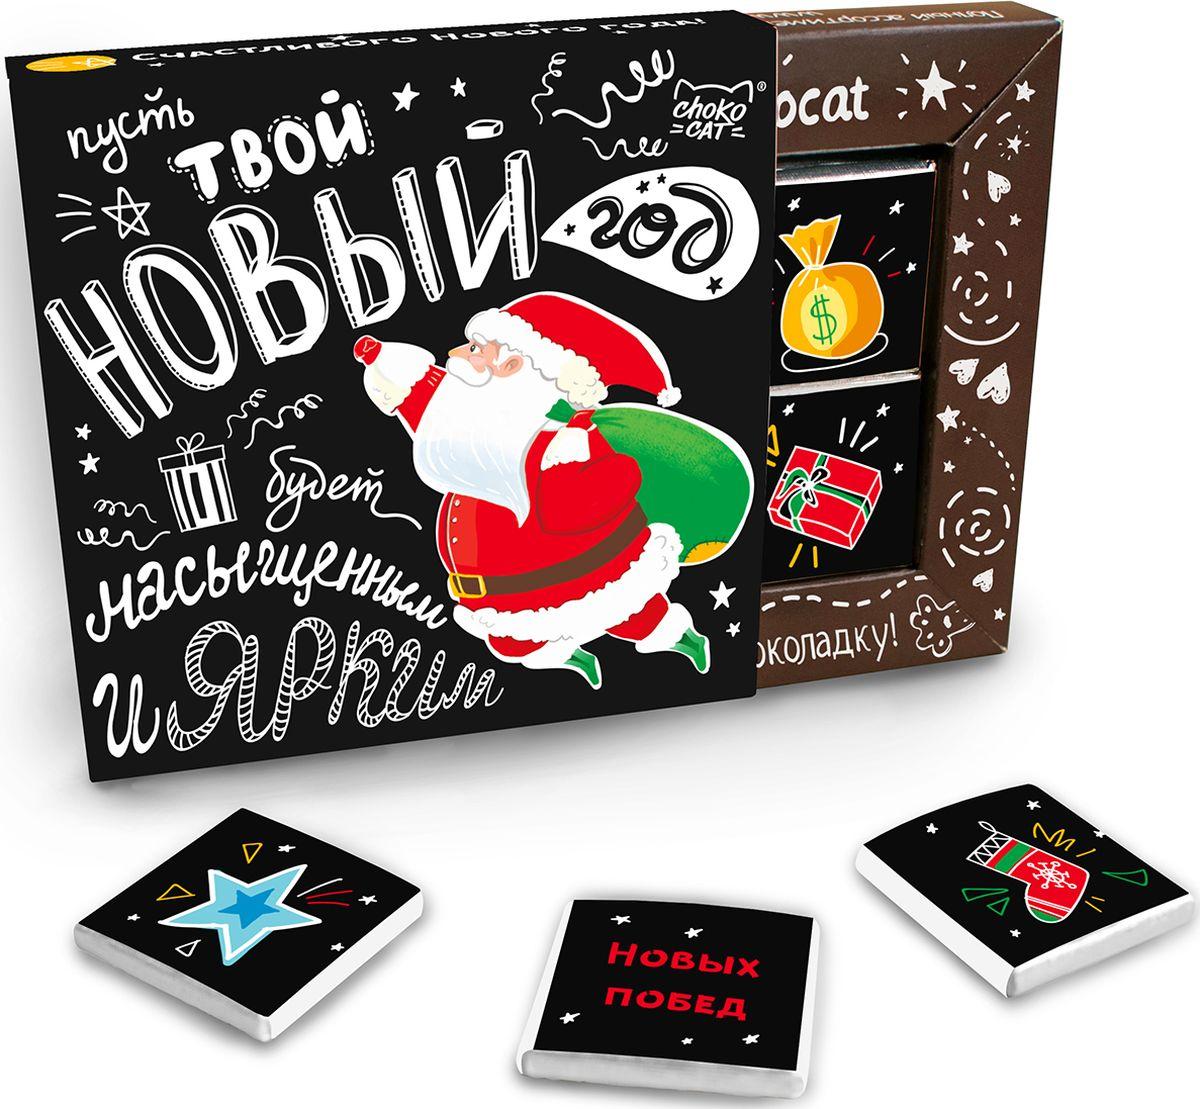 Chokocat Супер Дед Мороз молочный шоколад, 60 г chokocat влюбленным молочный шоколад 60 г